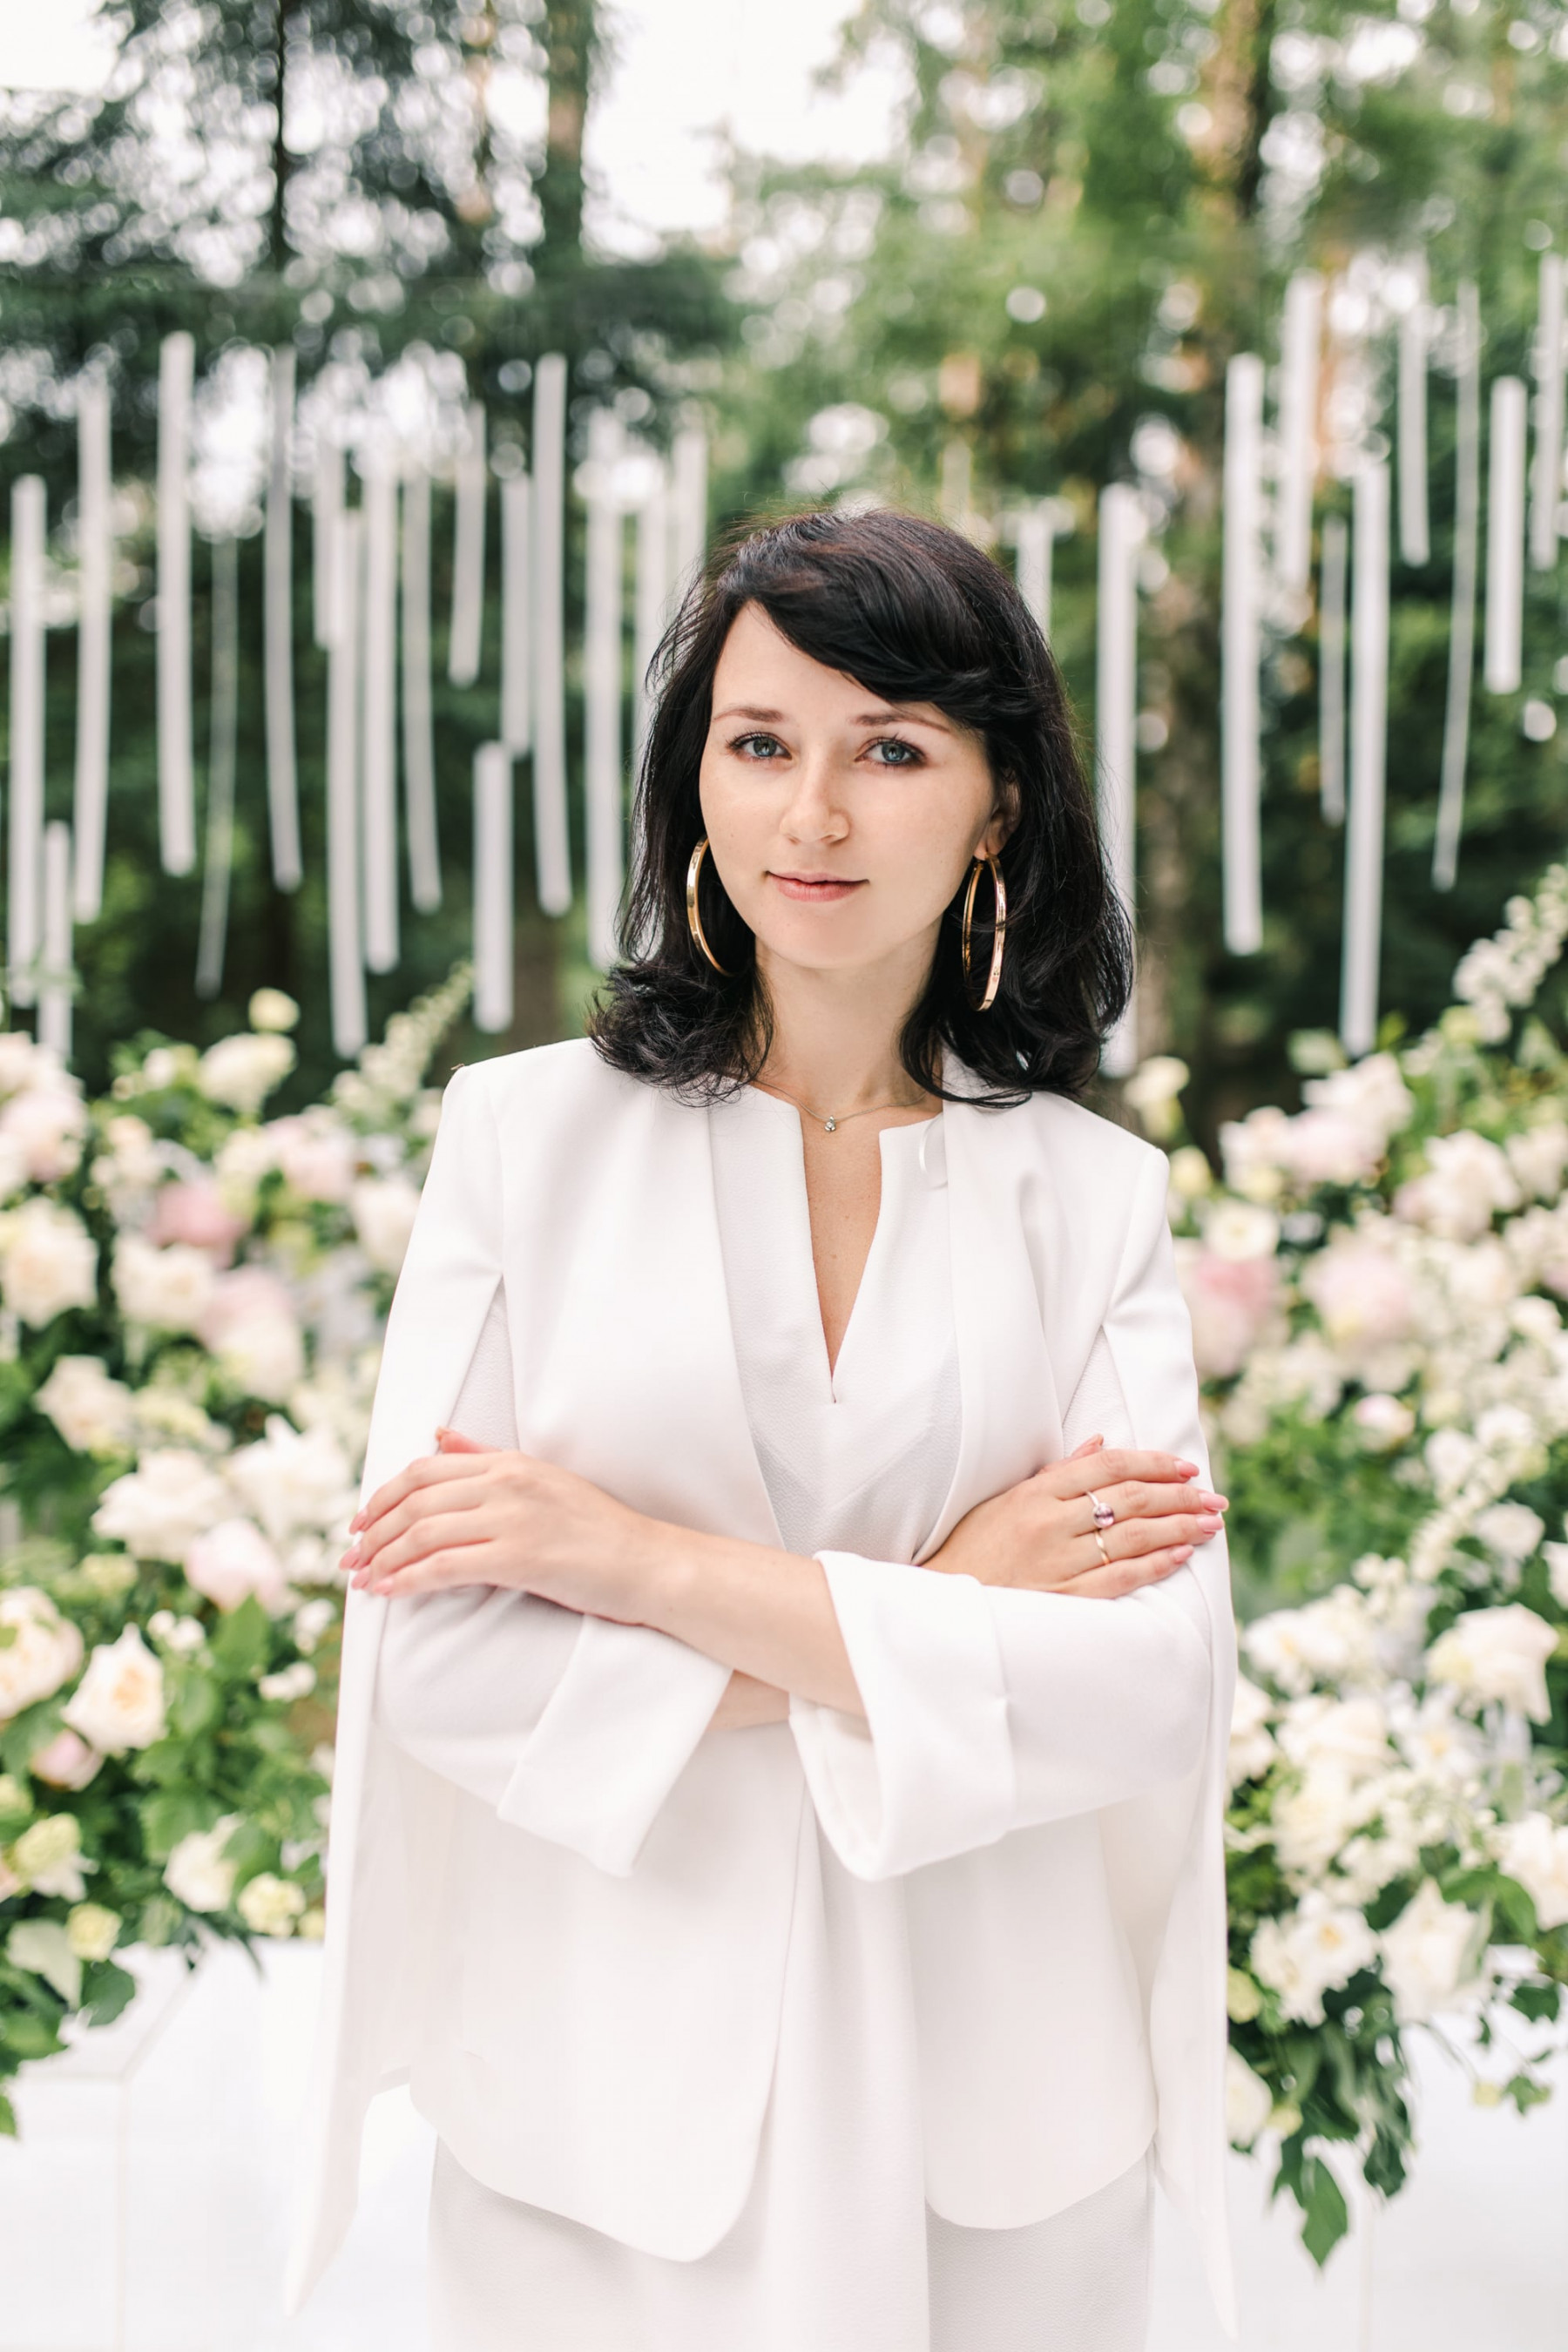 Кристина Агеева о новом сервисе аренды свадебного